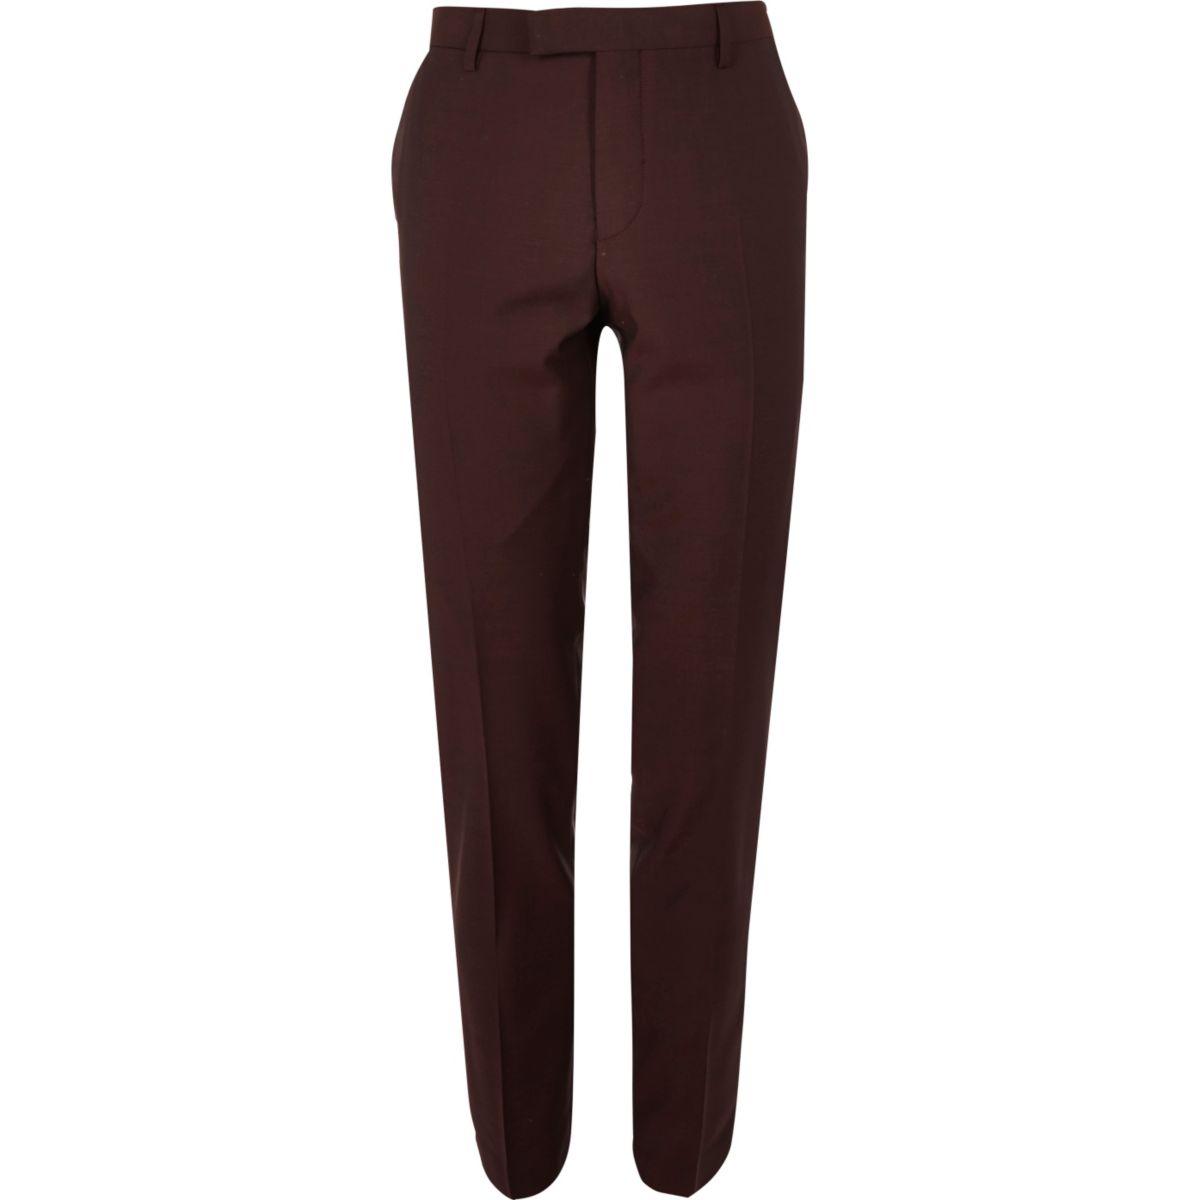 Berry skinny fit suit pants